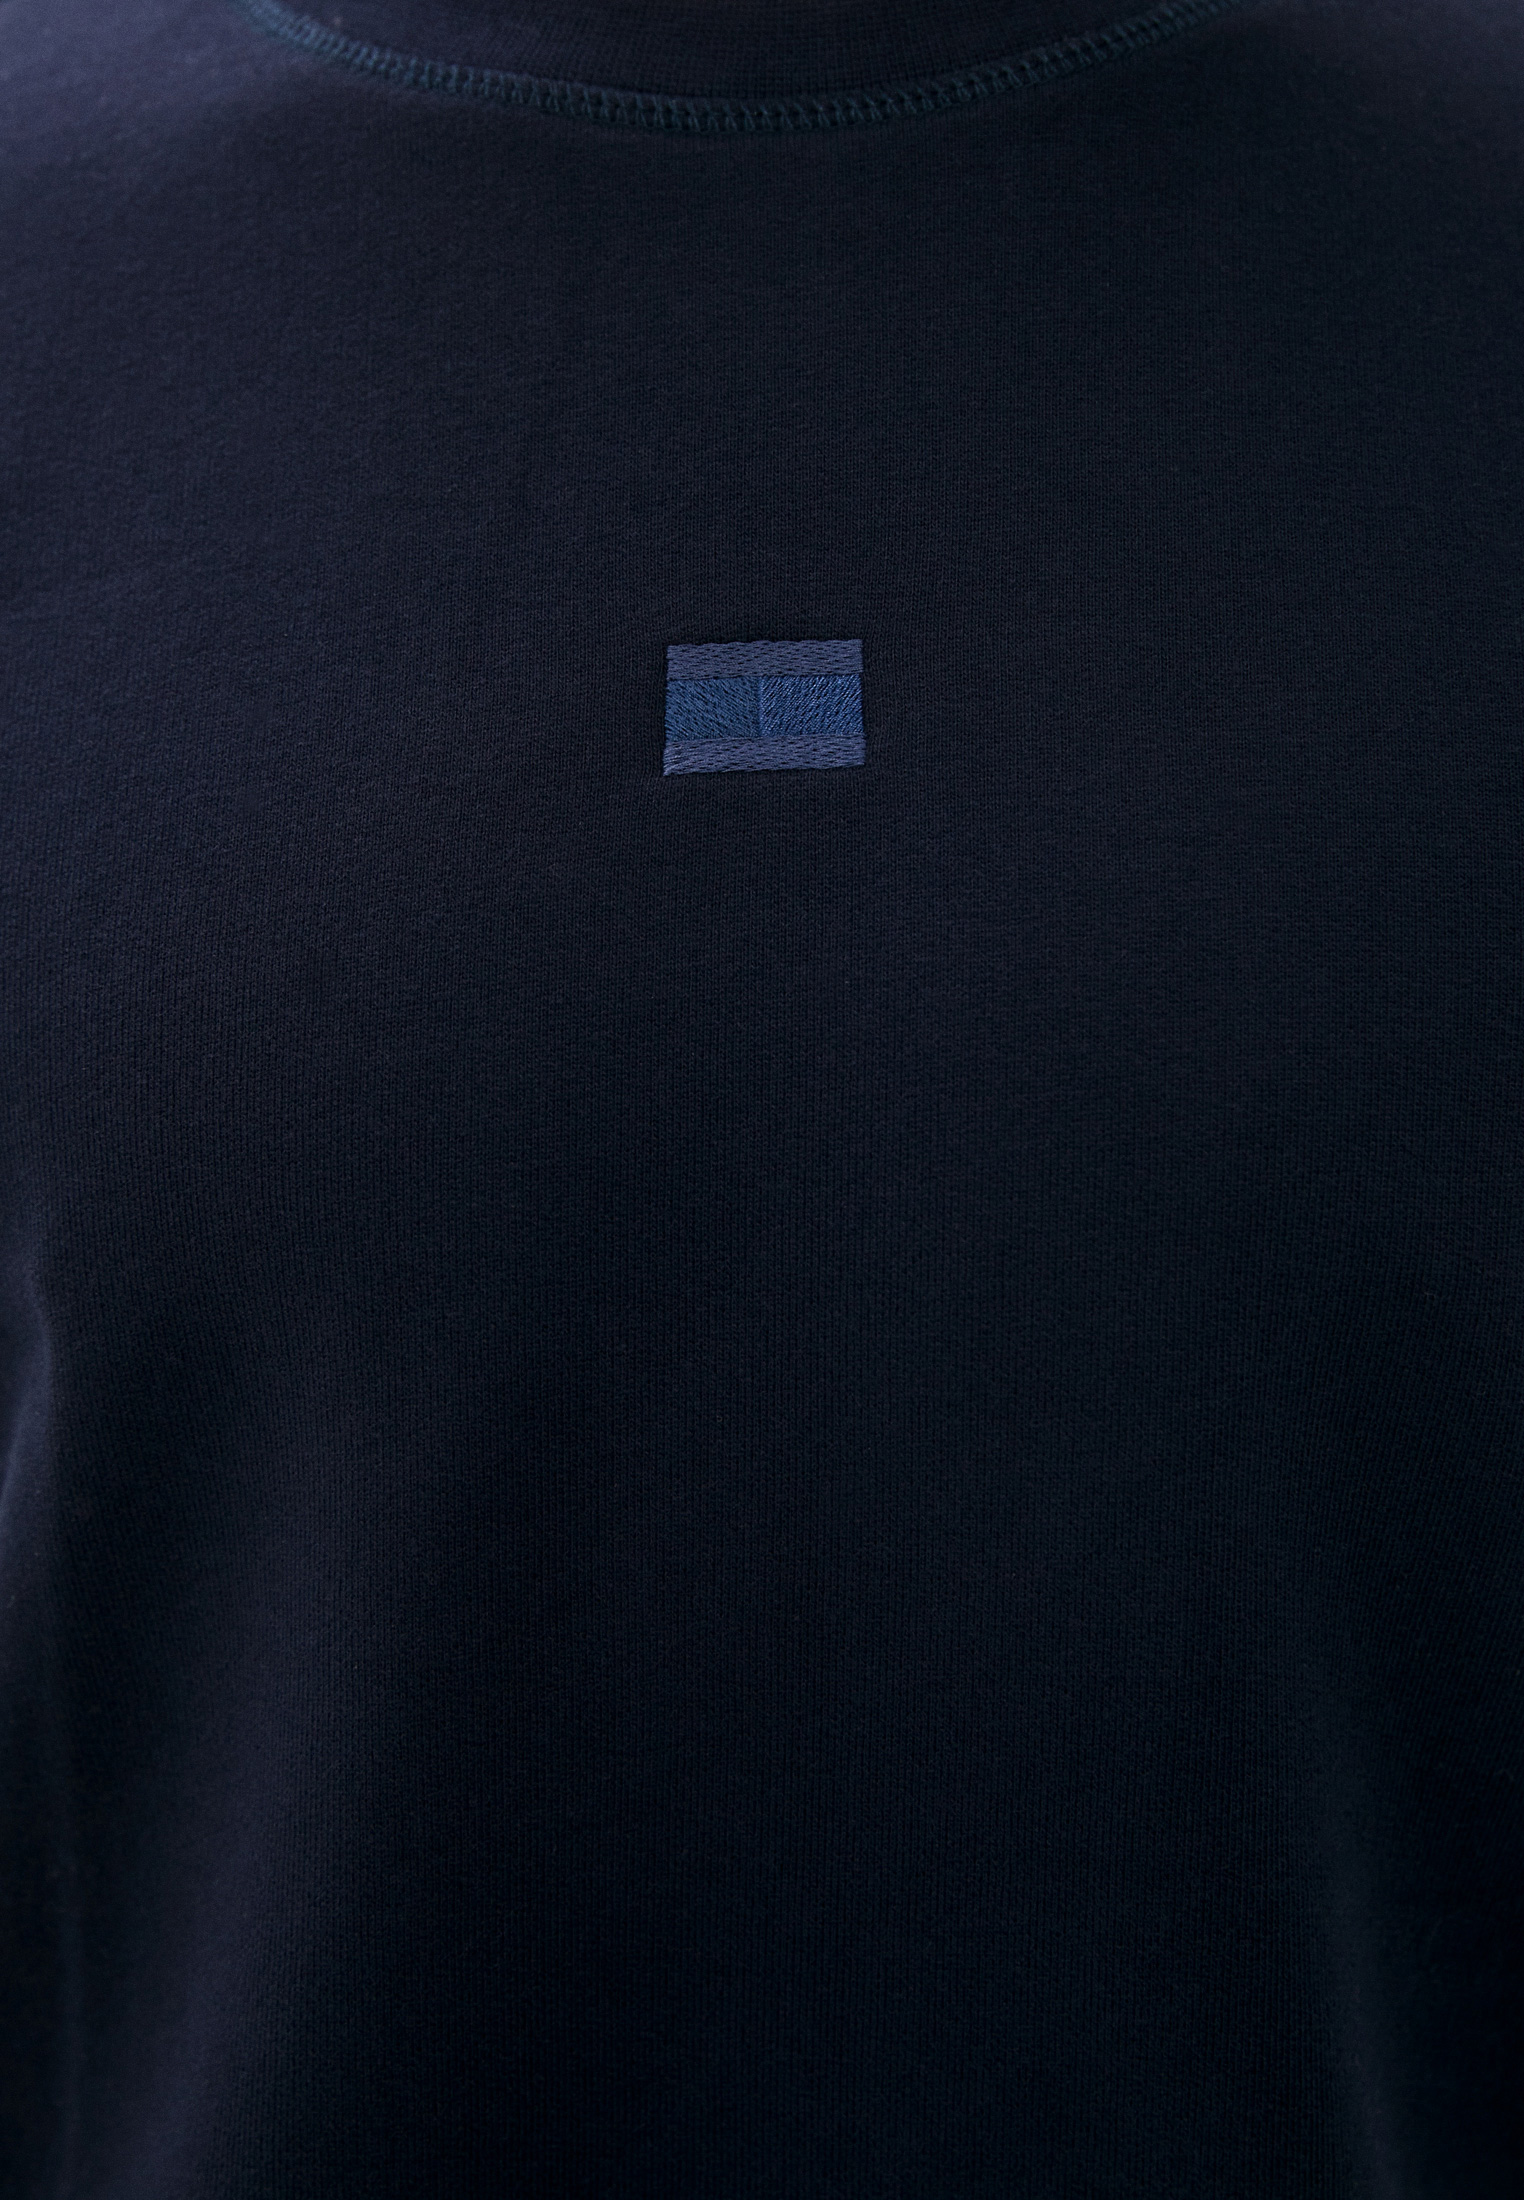 Свитер Tommy Hilfiger (Томми Хилфигер) MW0MW17399: изображение 4